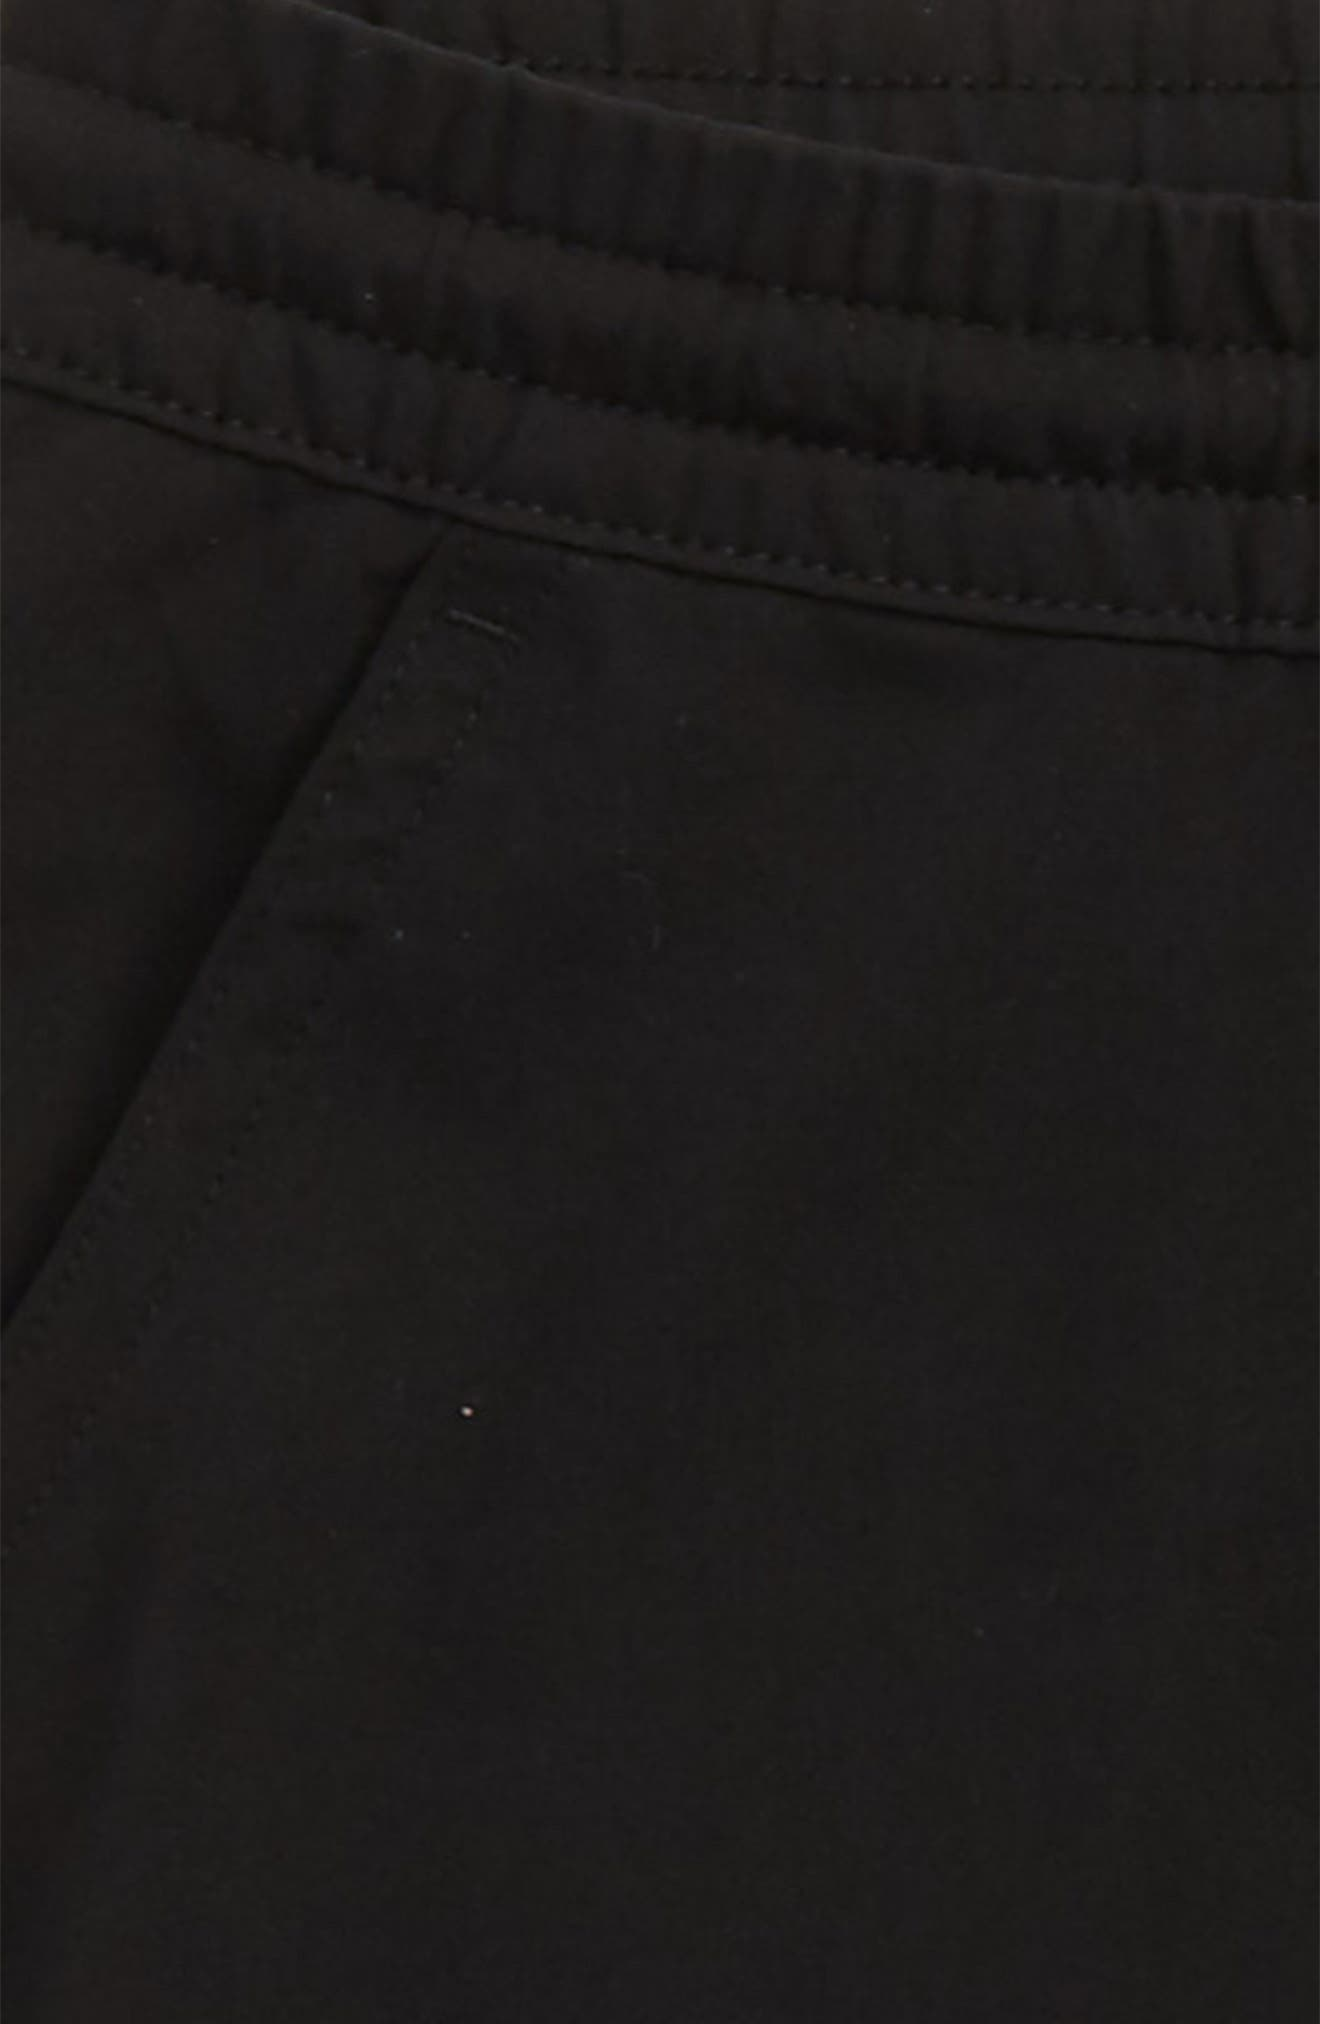 Elliot Woven Jogger Pants,                             Alternate thumbnail 2, color,                             Black